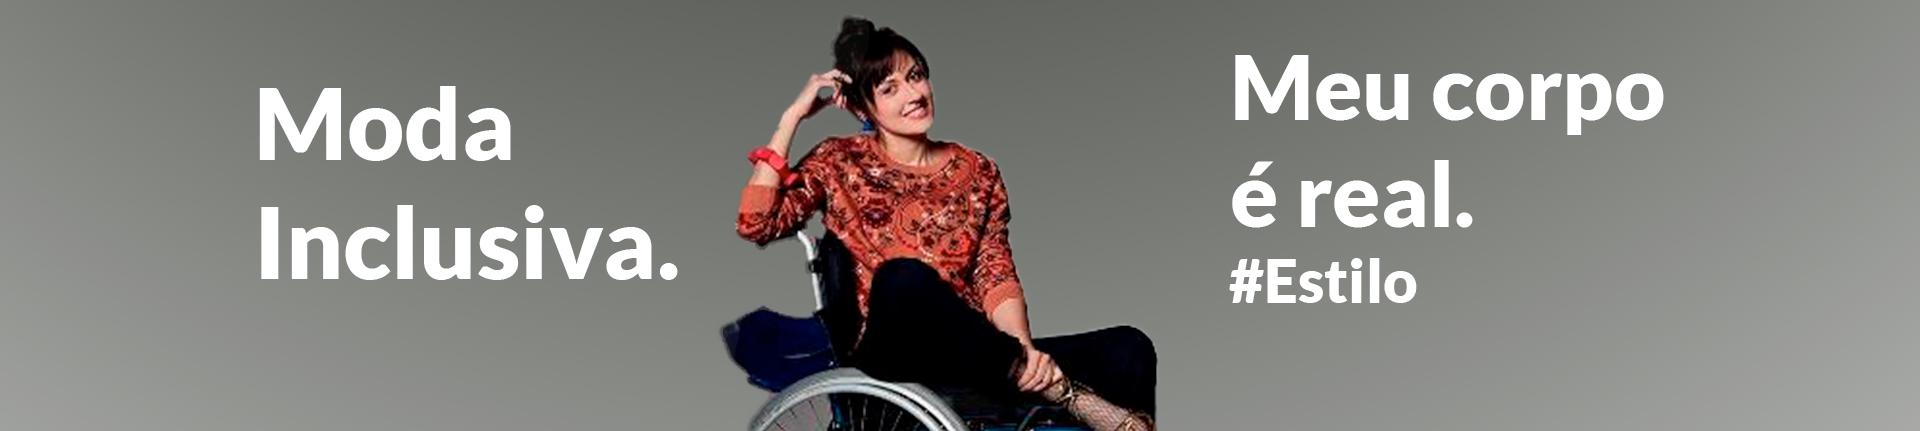 Moda inclusiva: Projeto Meu Corpo é Real